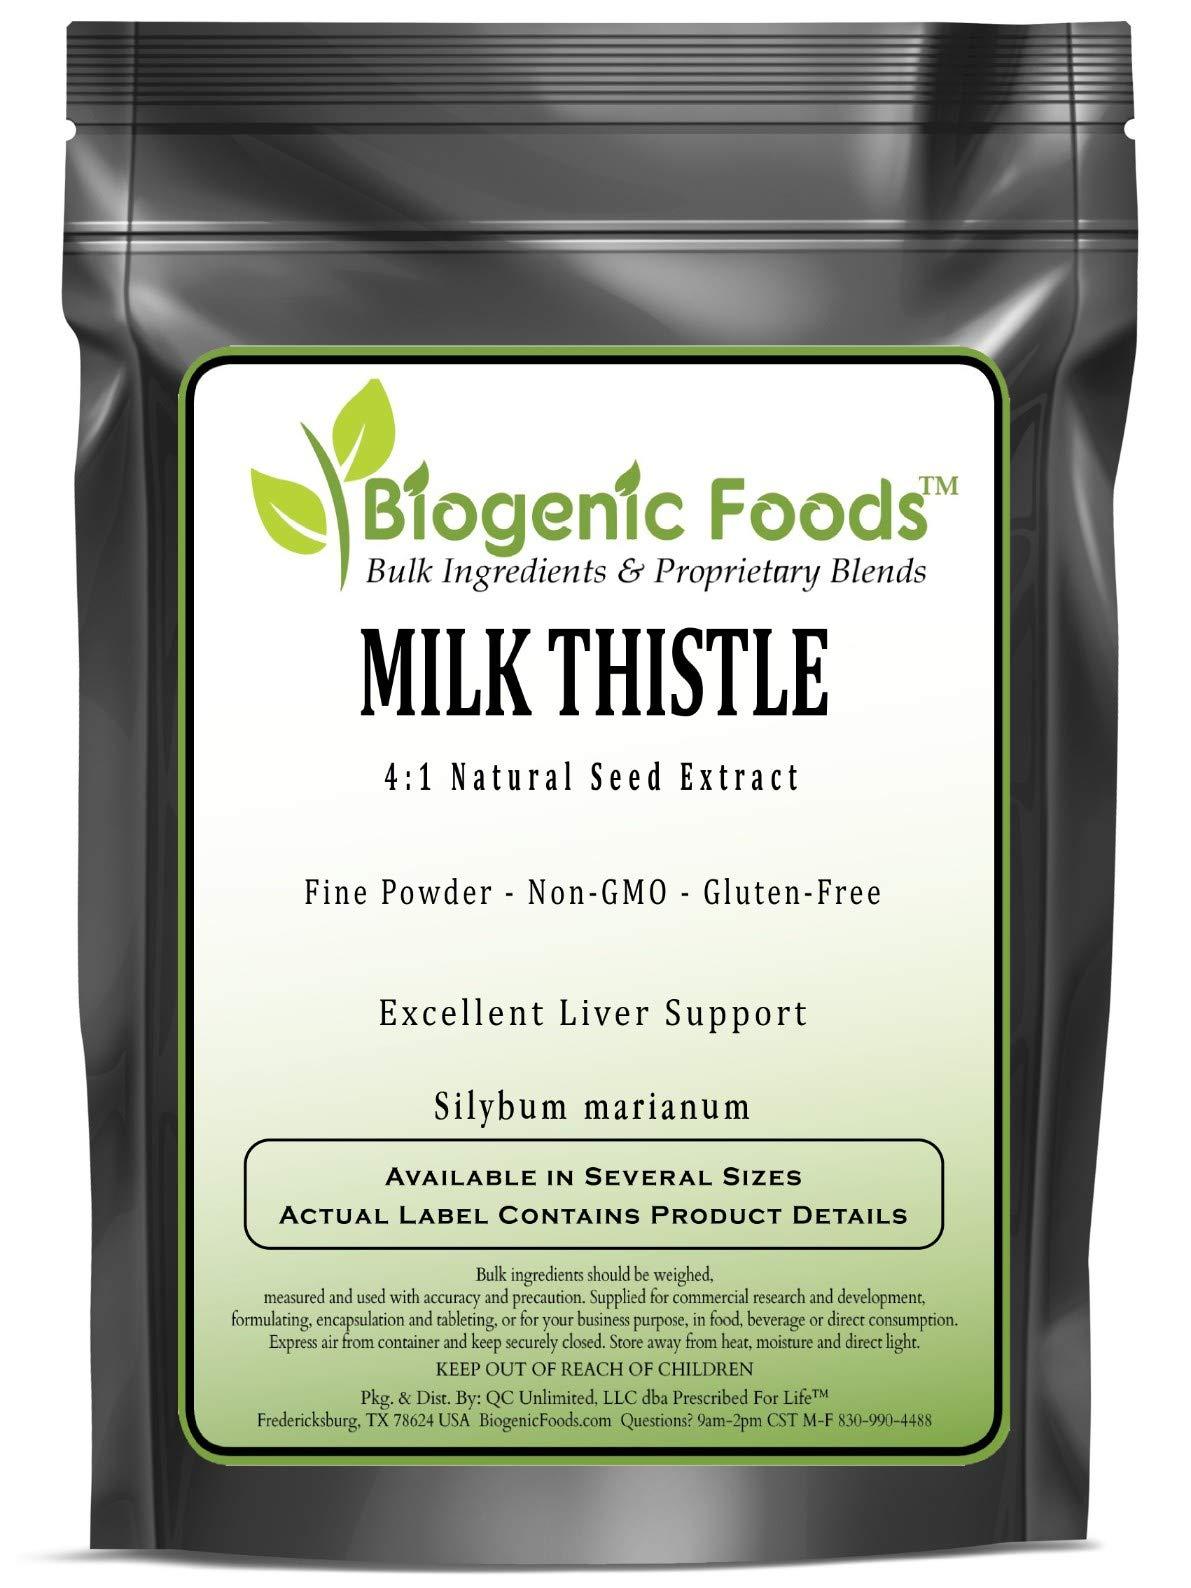 Milk Thistle - 4:1 Natural Seed Fine Powder Extract (Silybum marianum), 5 kg